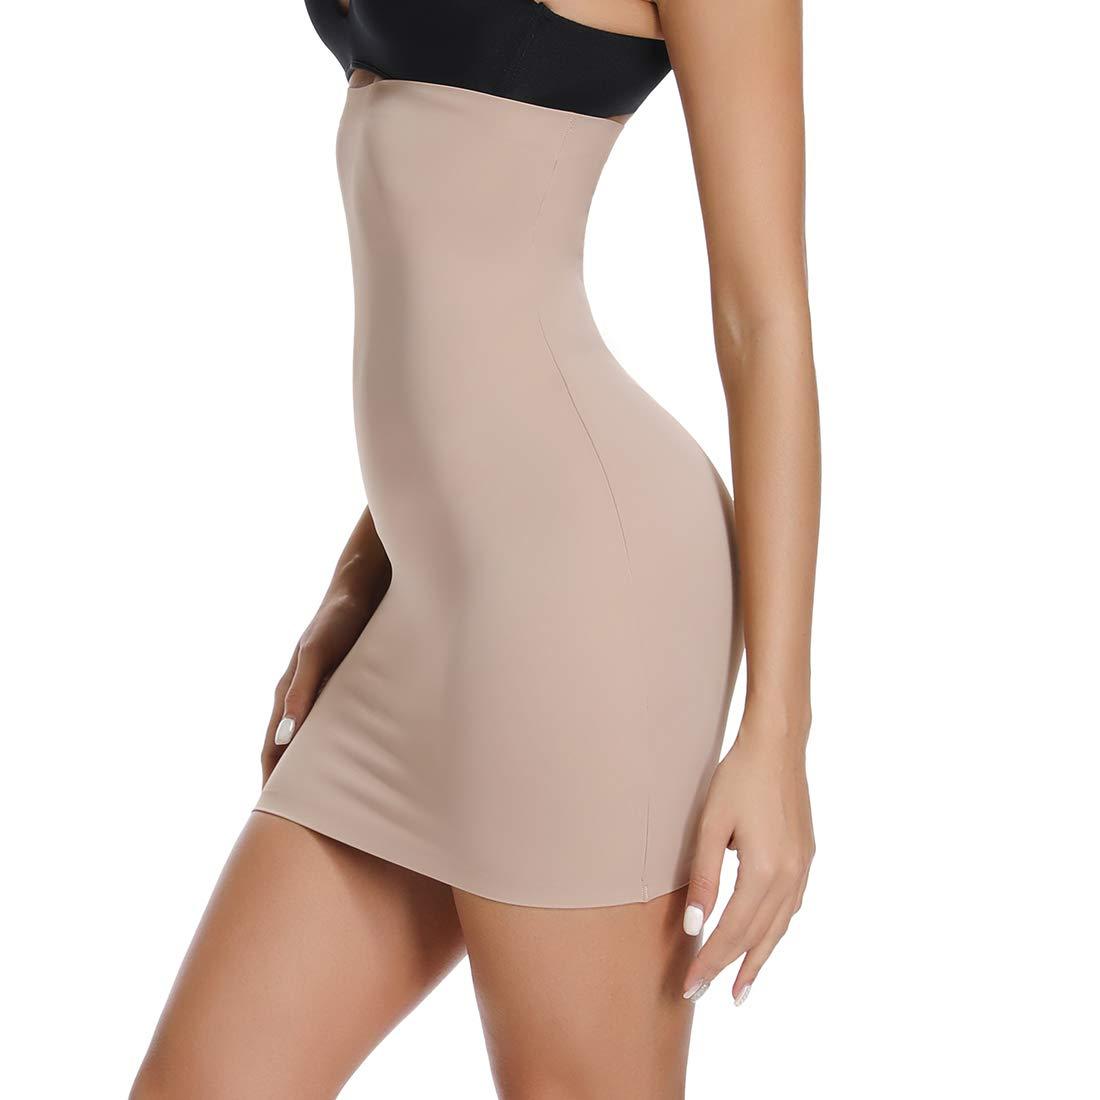 Half Slips for Women Under Dress High Waist Tummy Control Top Shapewear Slimming Butt Lifter